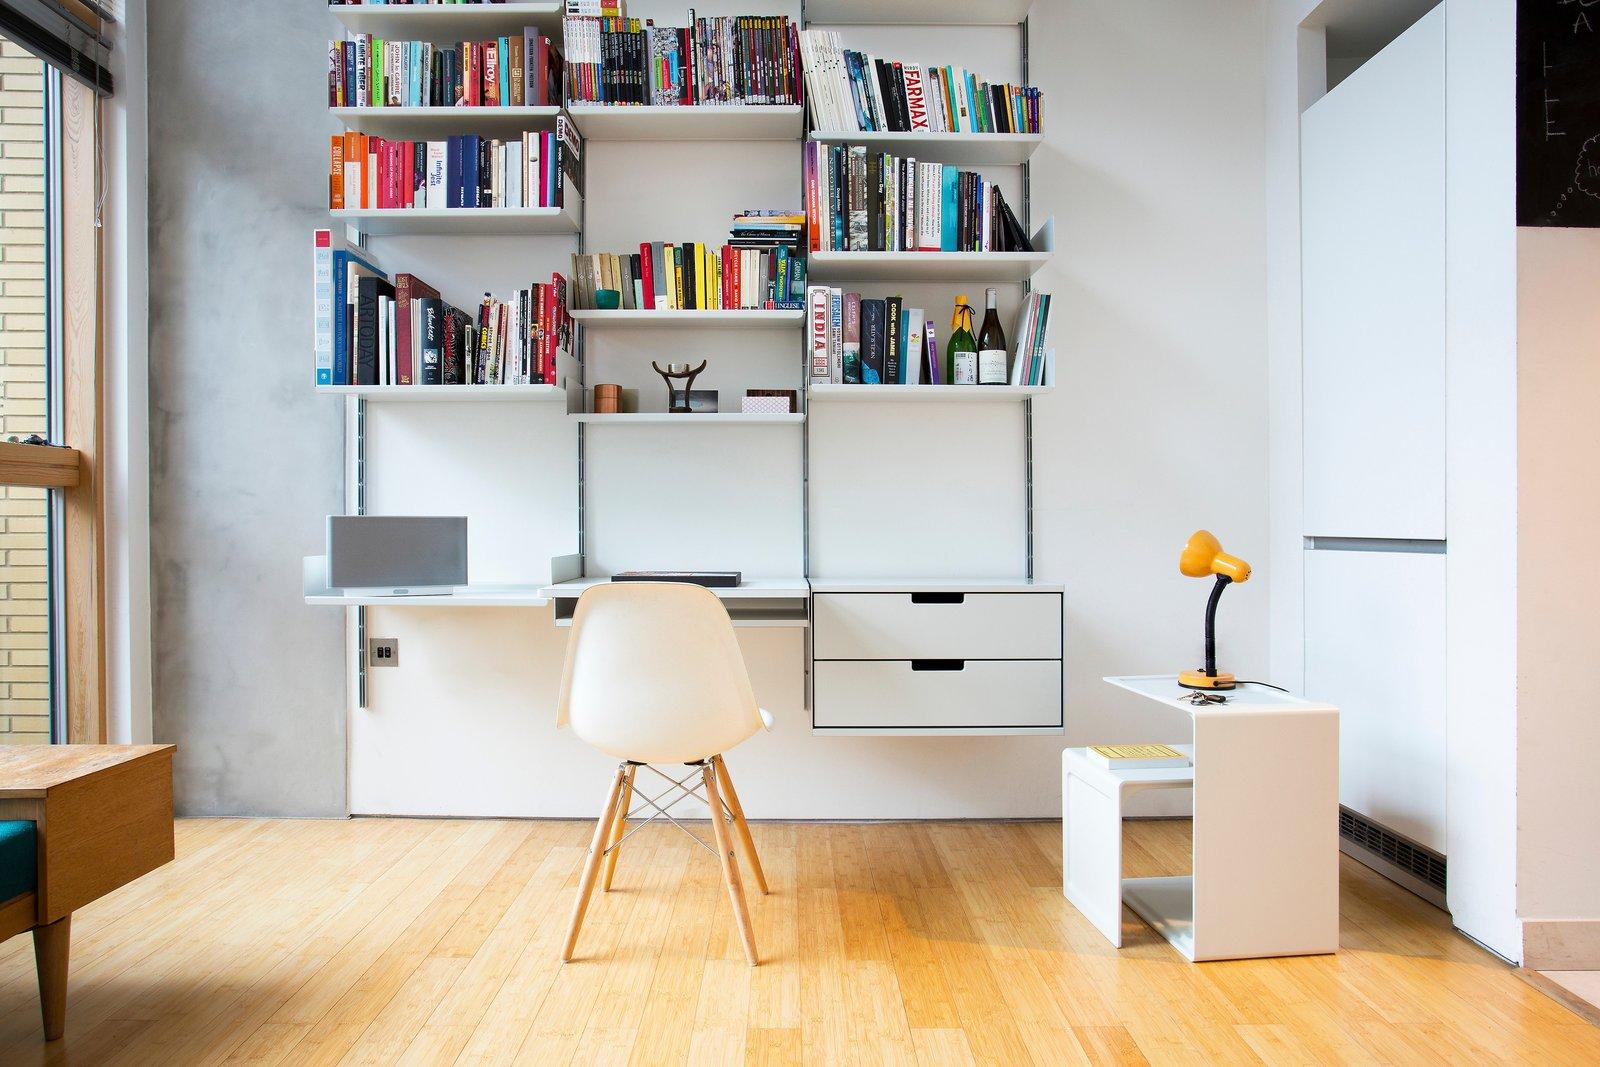 Office, Chair, Shelves, Desk, Light Hardwood Floor, and Lamps  Dieter Rams is the man!